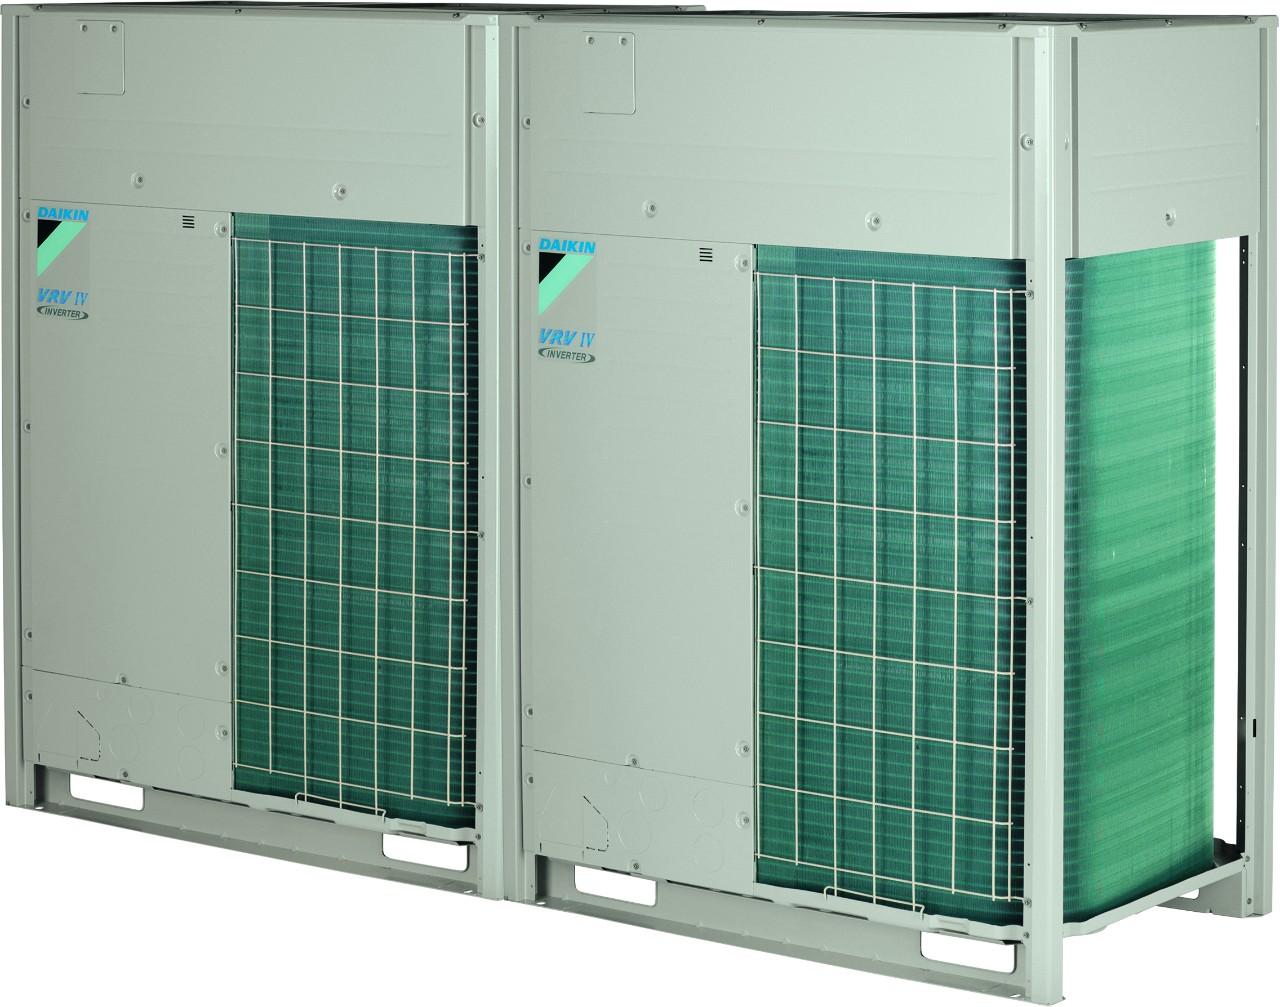 Daikin Ryyq T Vrv Iv Heat Pump With Continuous Heating 22